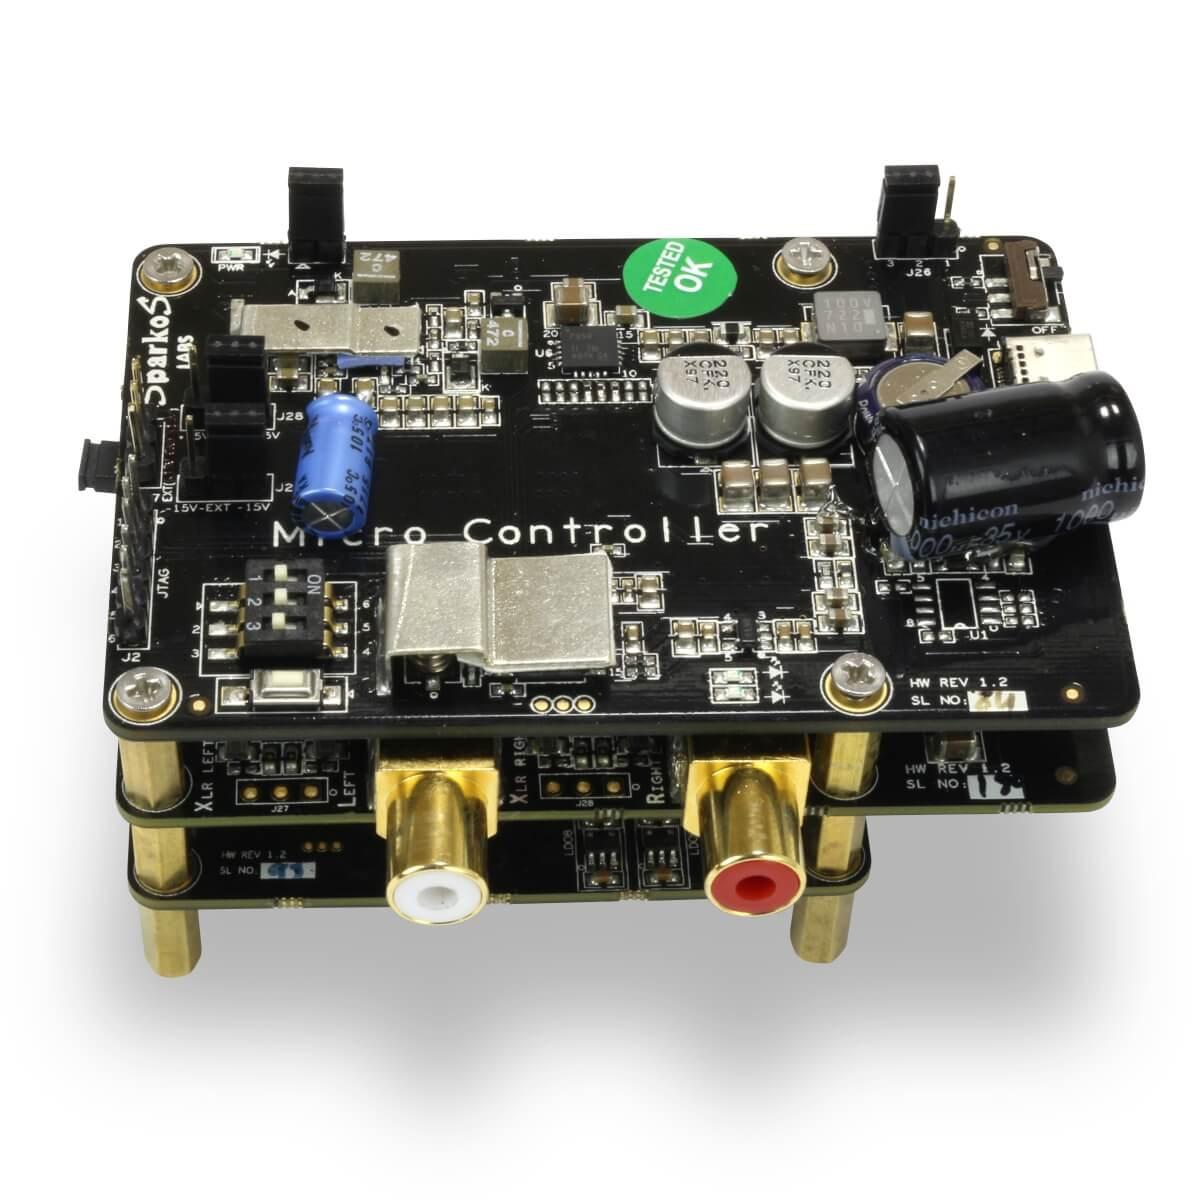 ALLO KATANA 1.2 SOUND QUALITY DAC for Raspberry Pi ES9038Q2M 6x AOP SparkoS Labs SS3601 32bit 384kHz DSD128